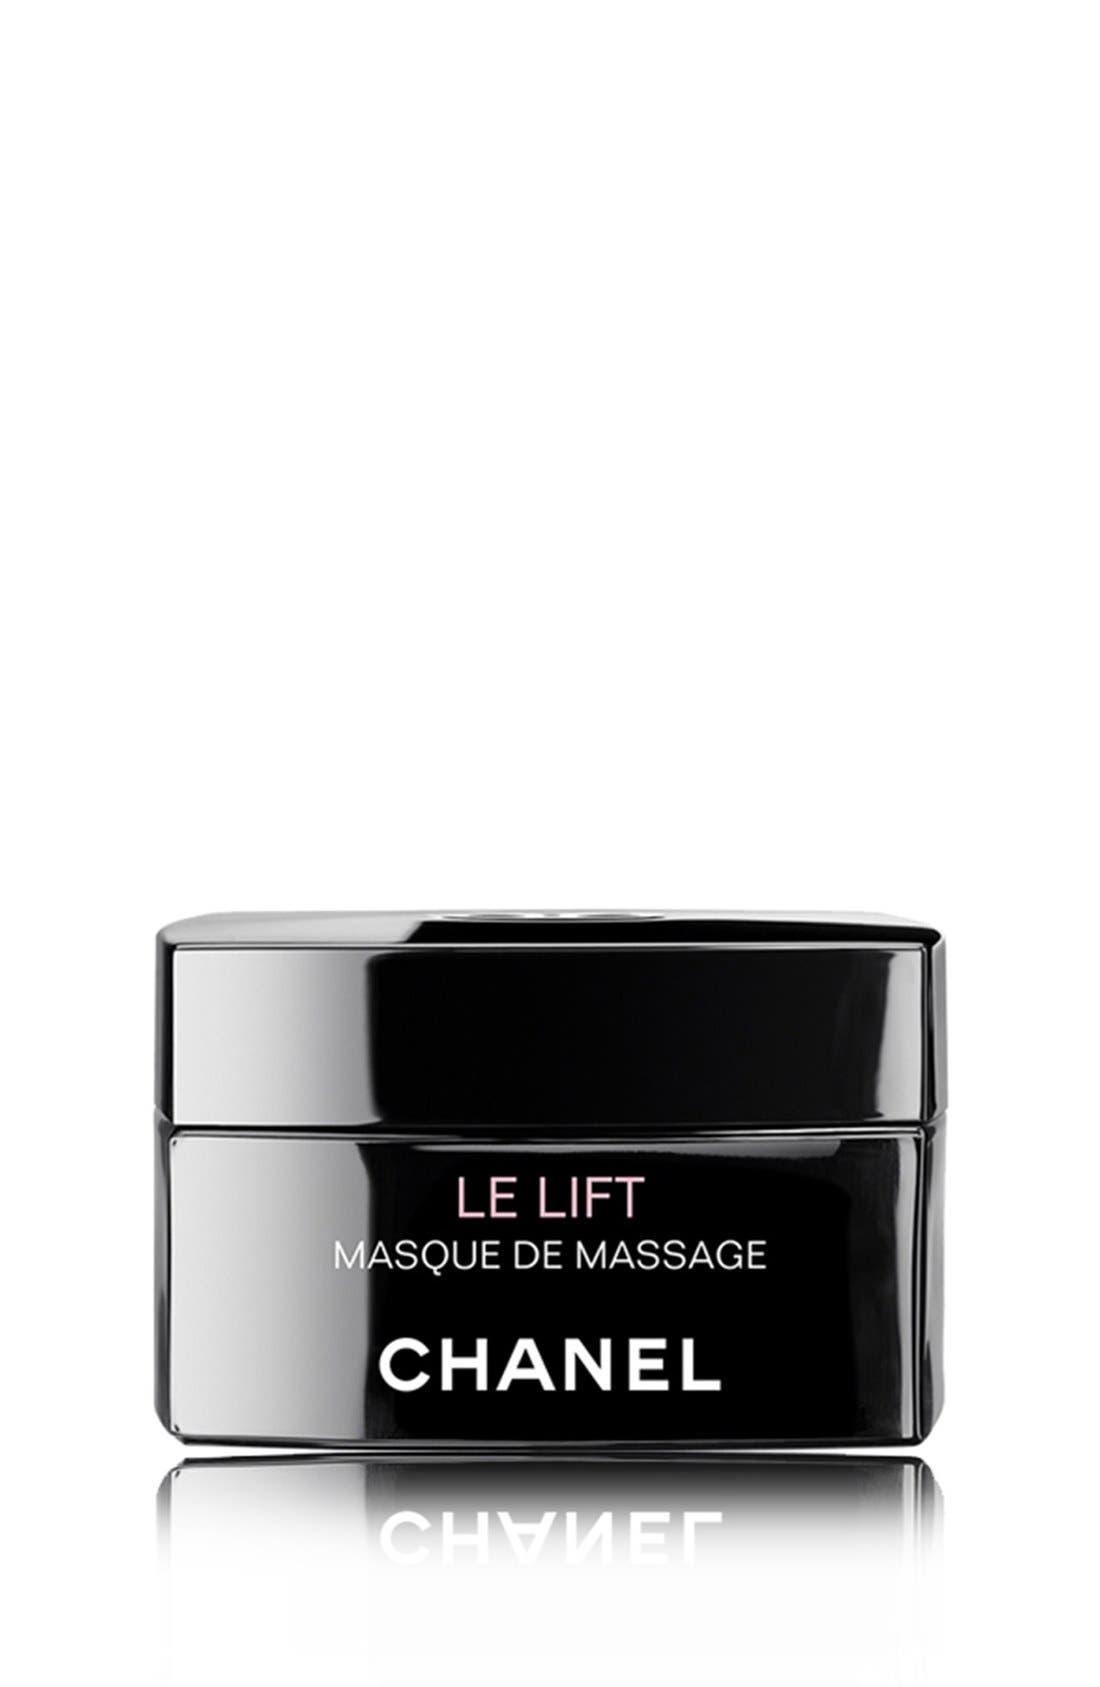 CHANEL LE LIFT MASQUE DE MASSAGE  Firming Anti-Wrinkle Recontouring Massage Mask